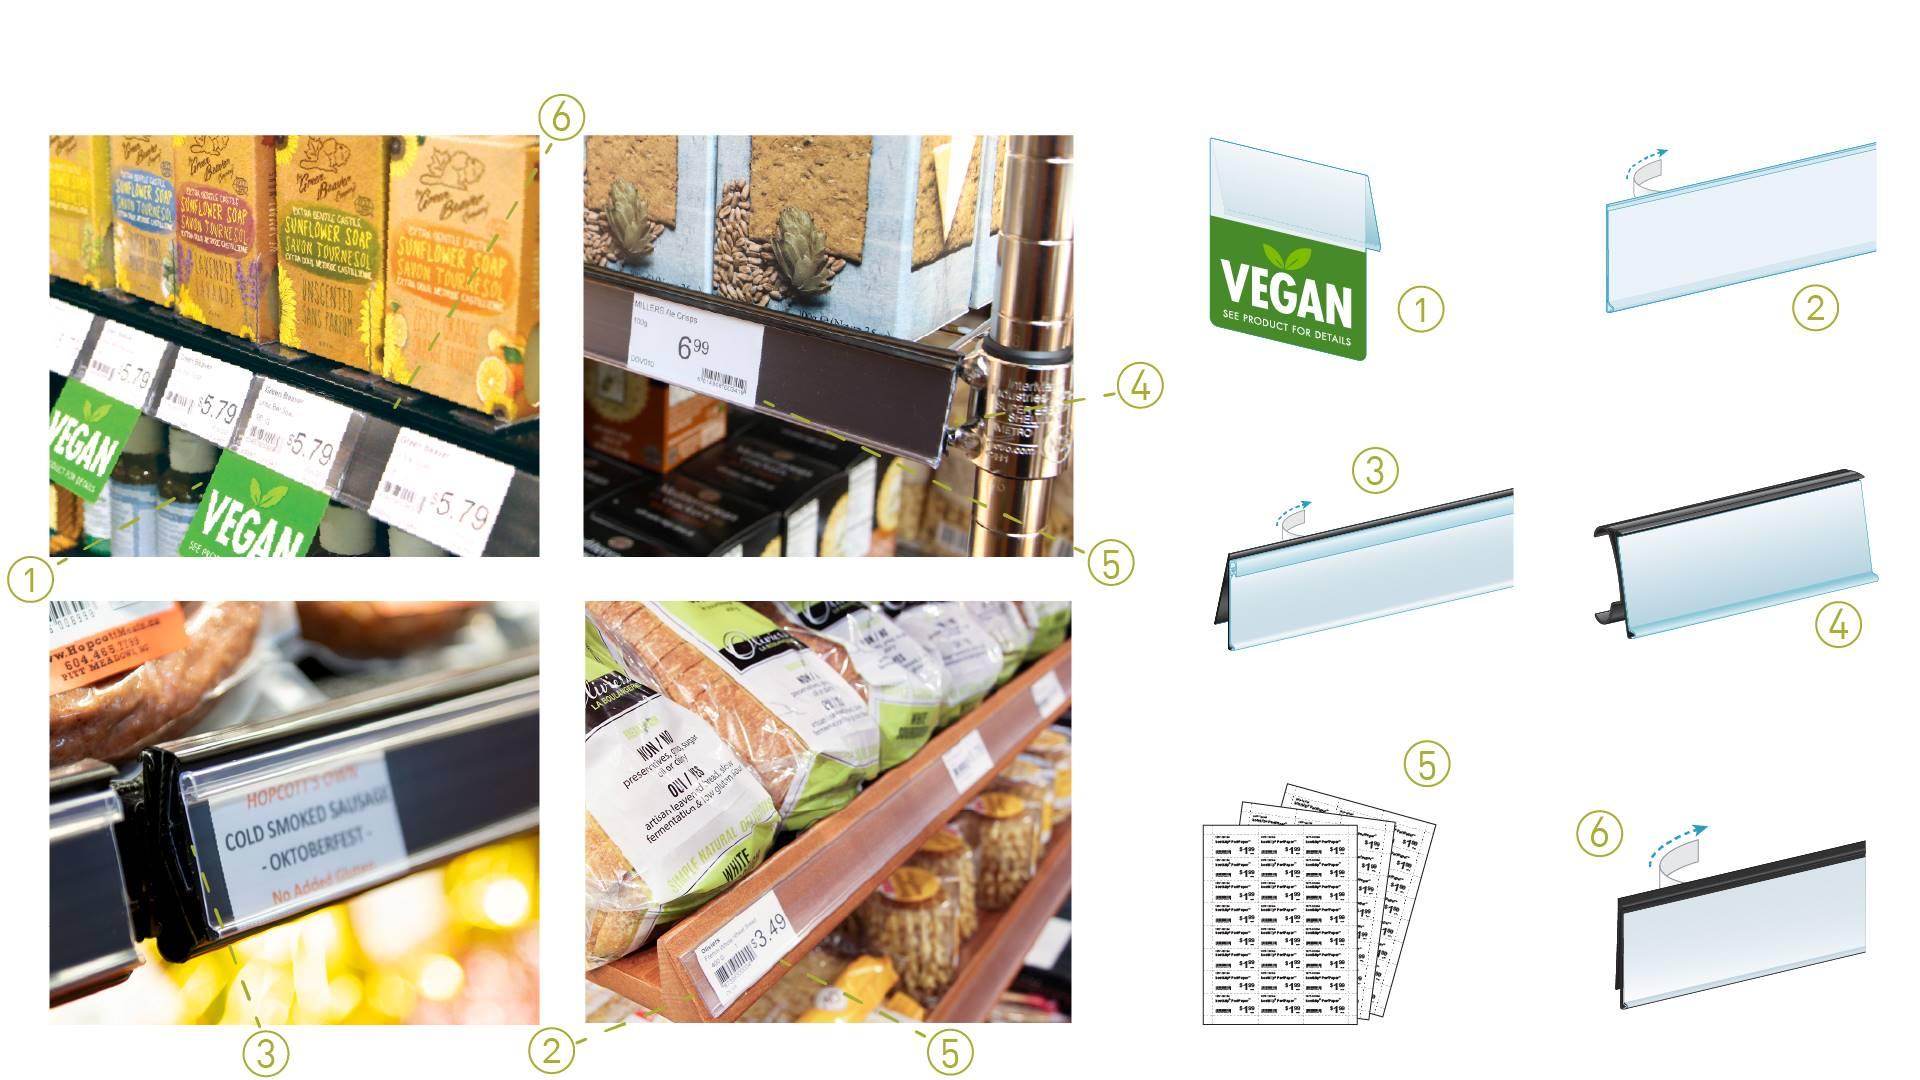 shelf edge labeling systems